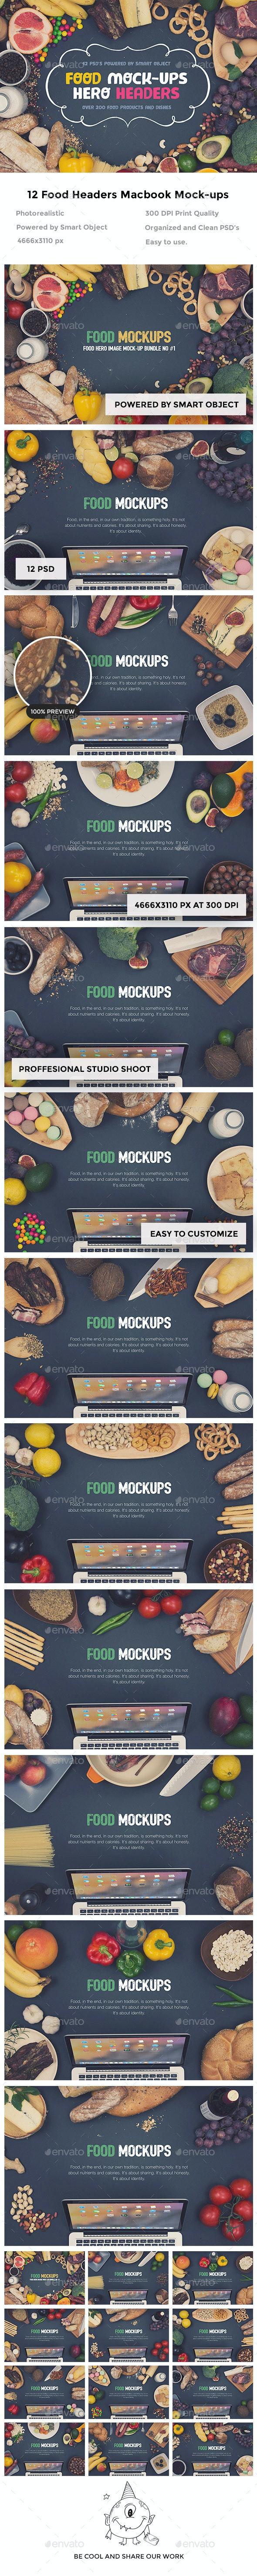 Food Hero Headers Macbook Mock-ups - Hero Images Graphics